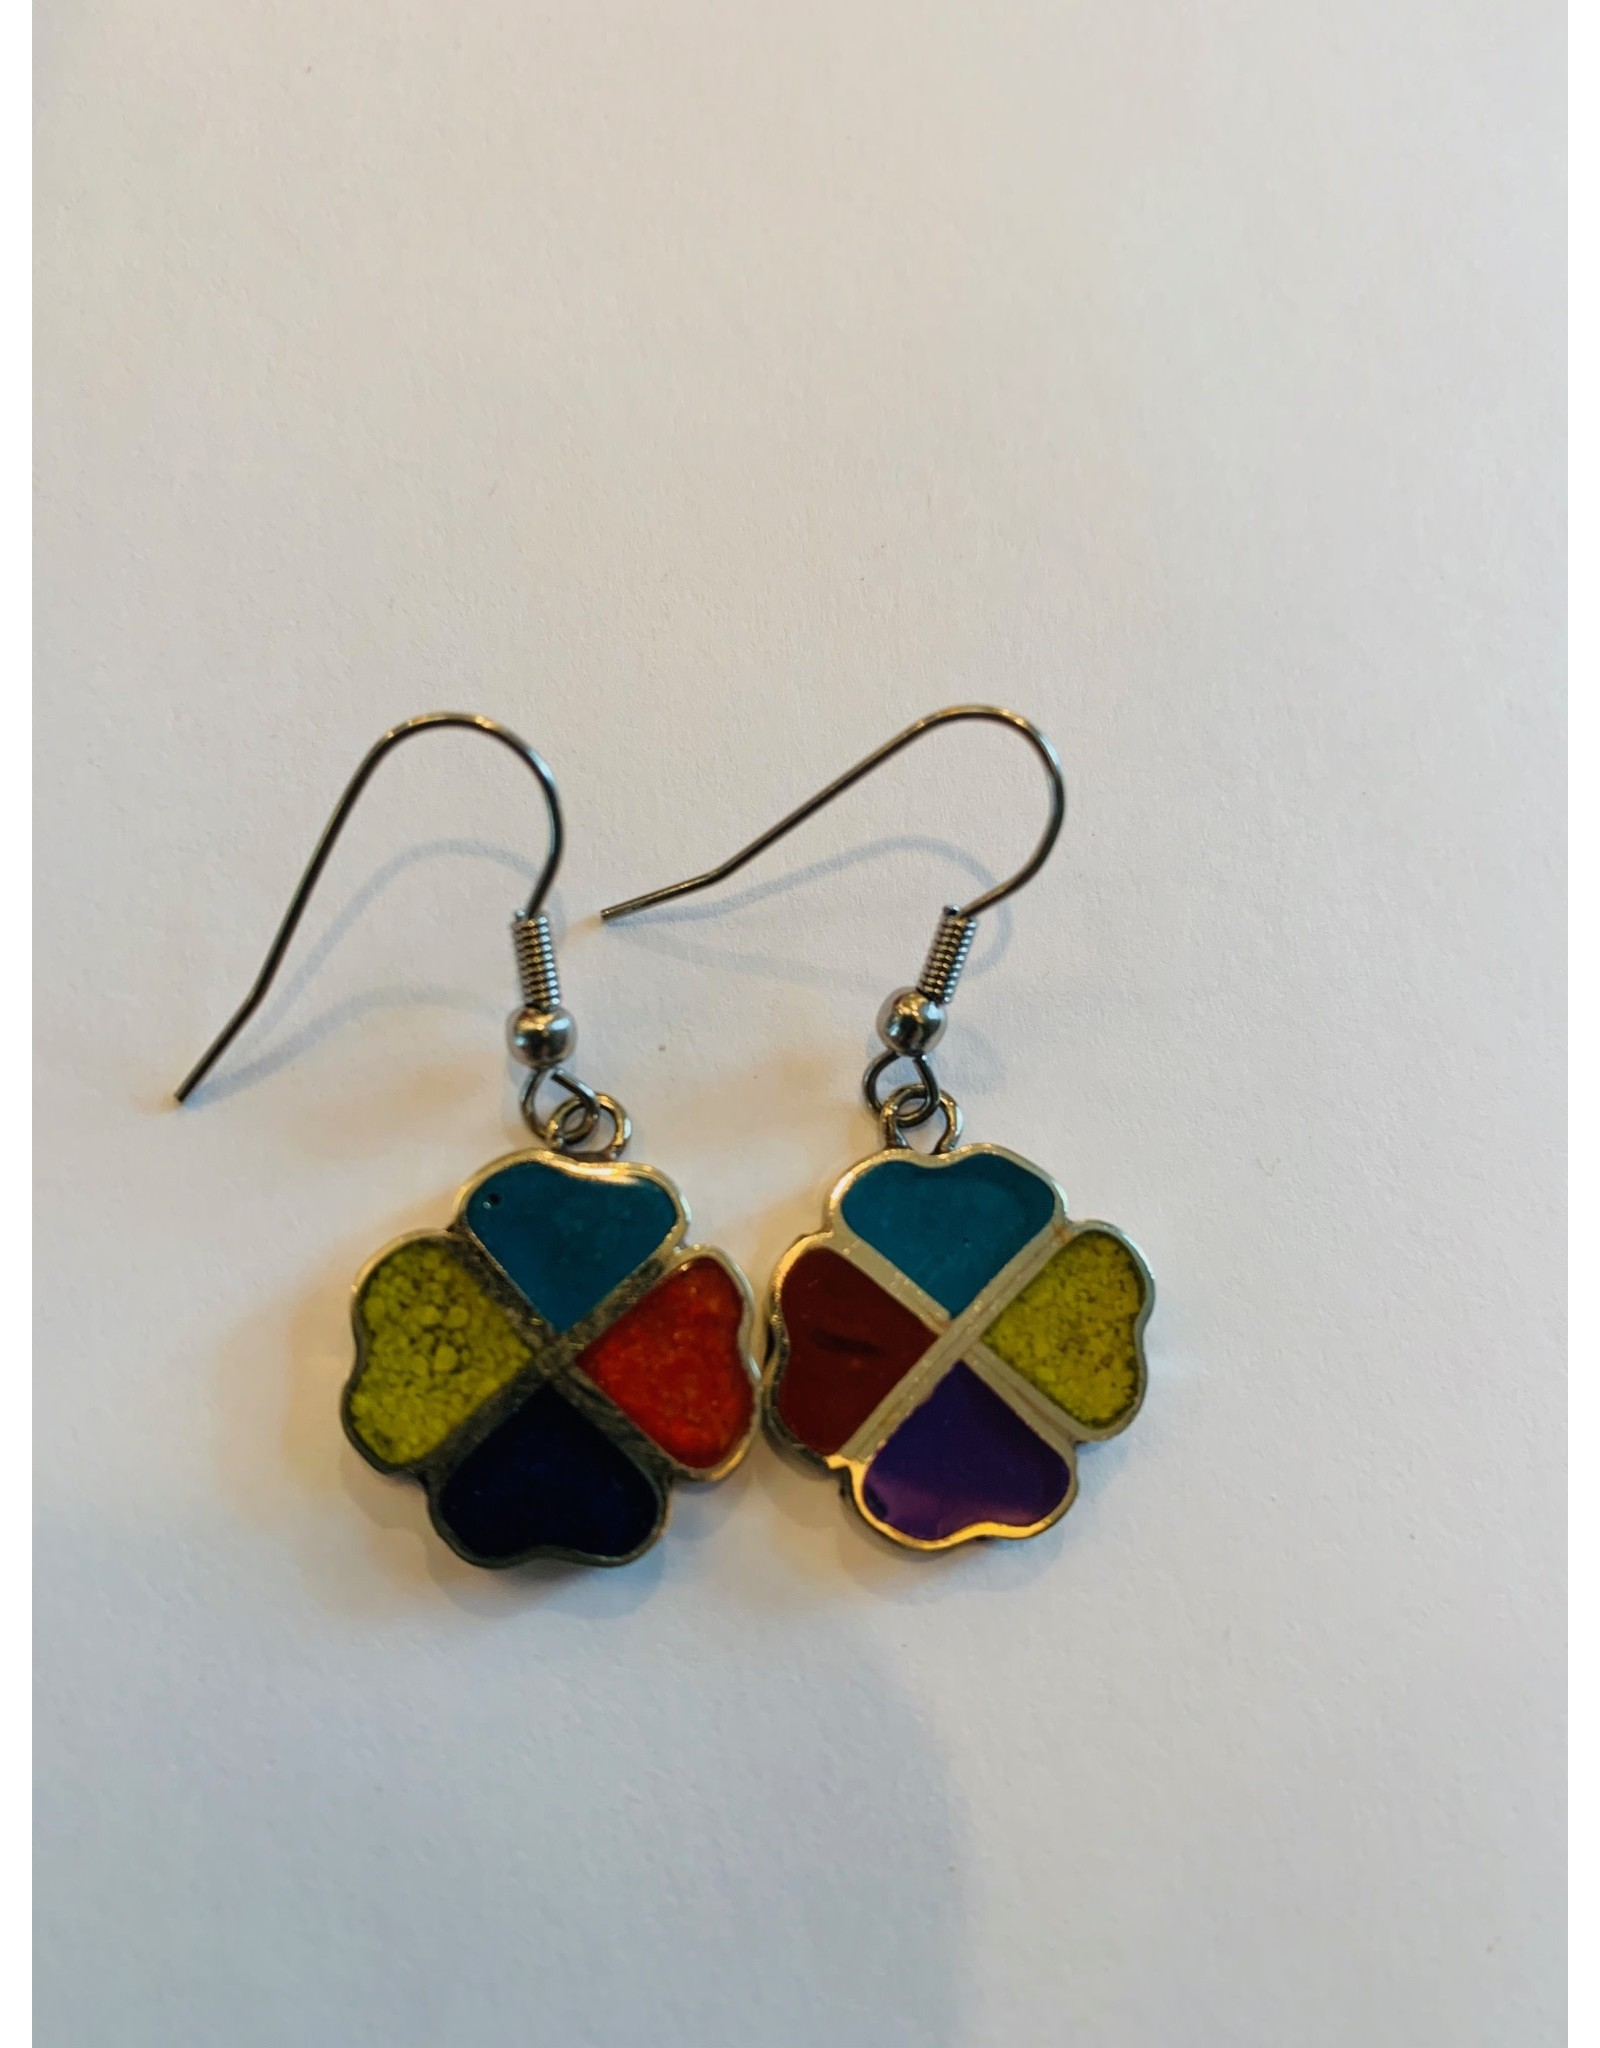 Alpaca Silver Resin Vivid Resin Earrings- Shamrock, Multicolor